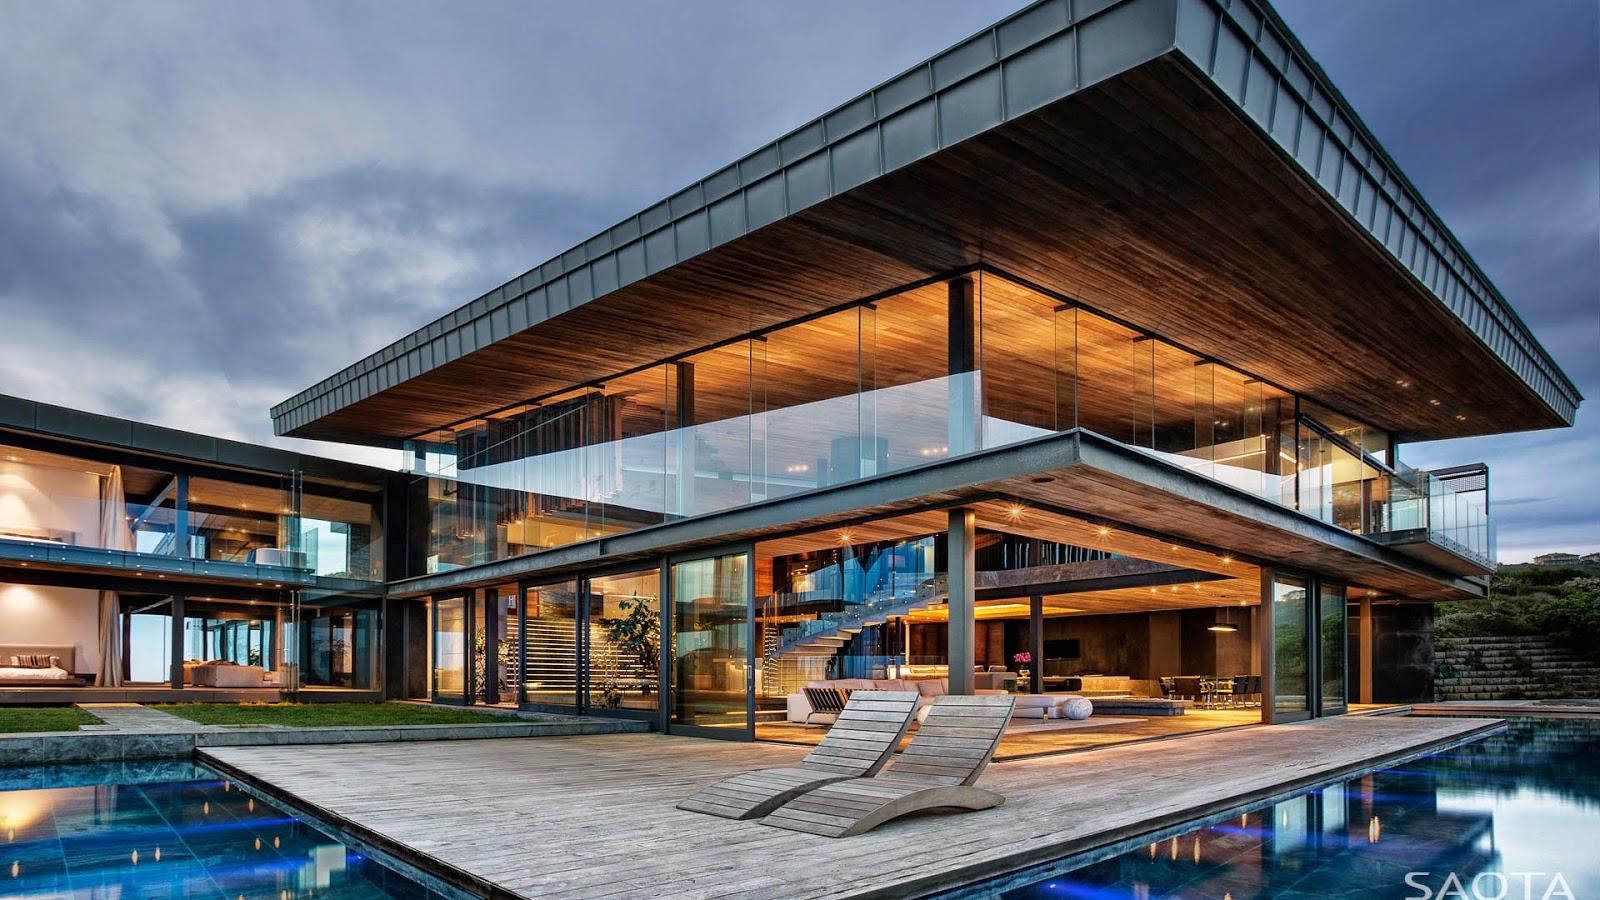 http://okoknoinc.blogspot.com/2015/03/cove-3-house-by-saota-stunning-house-in.html